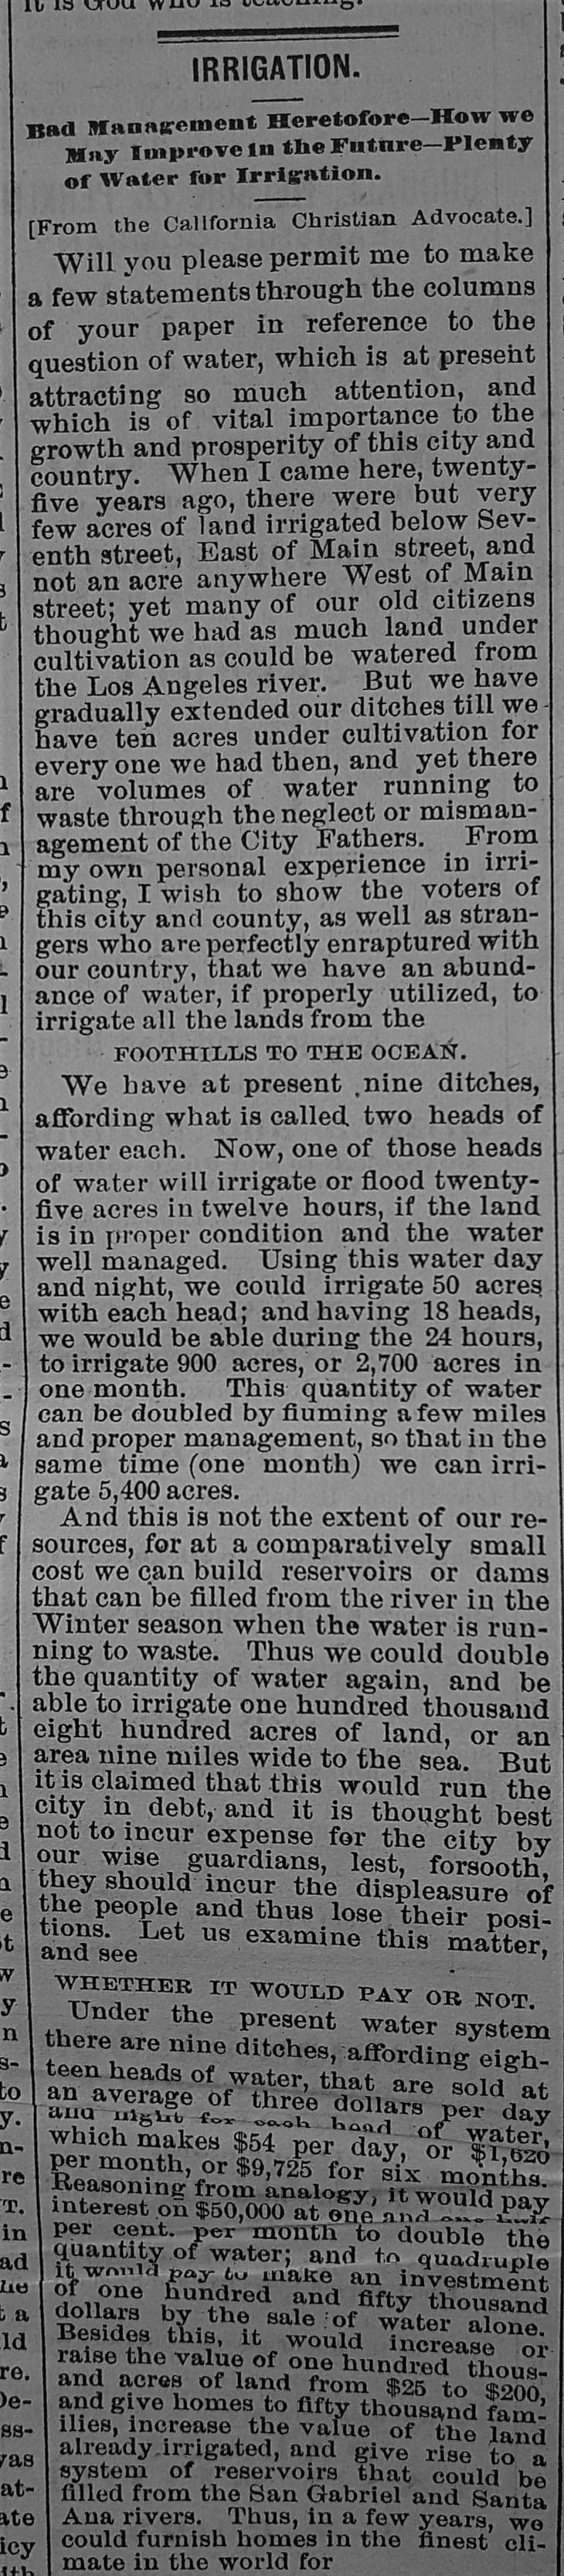 Irrigation 1 Herald 24Mar75